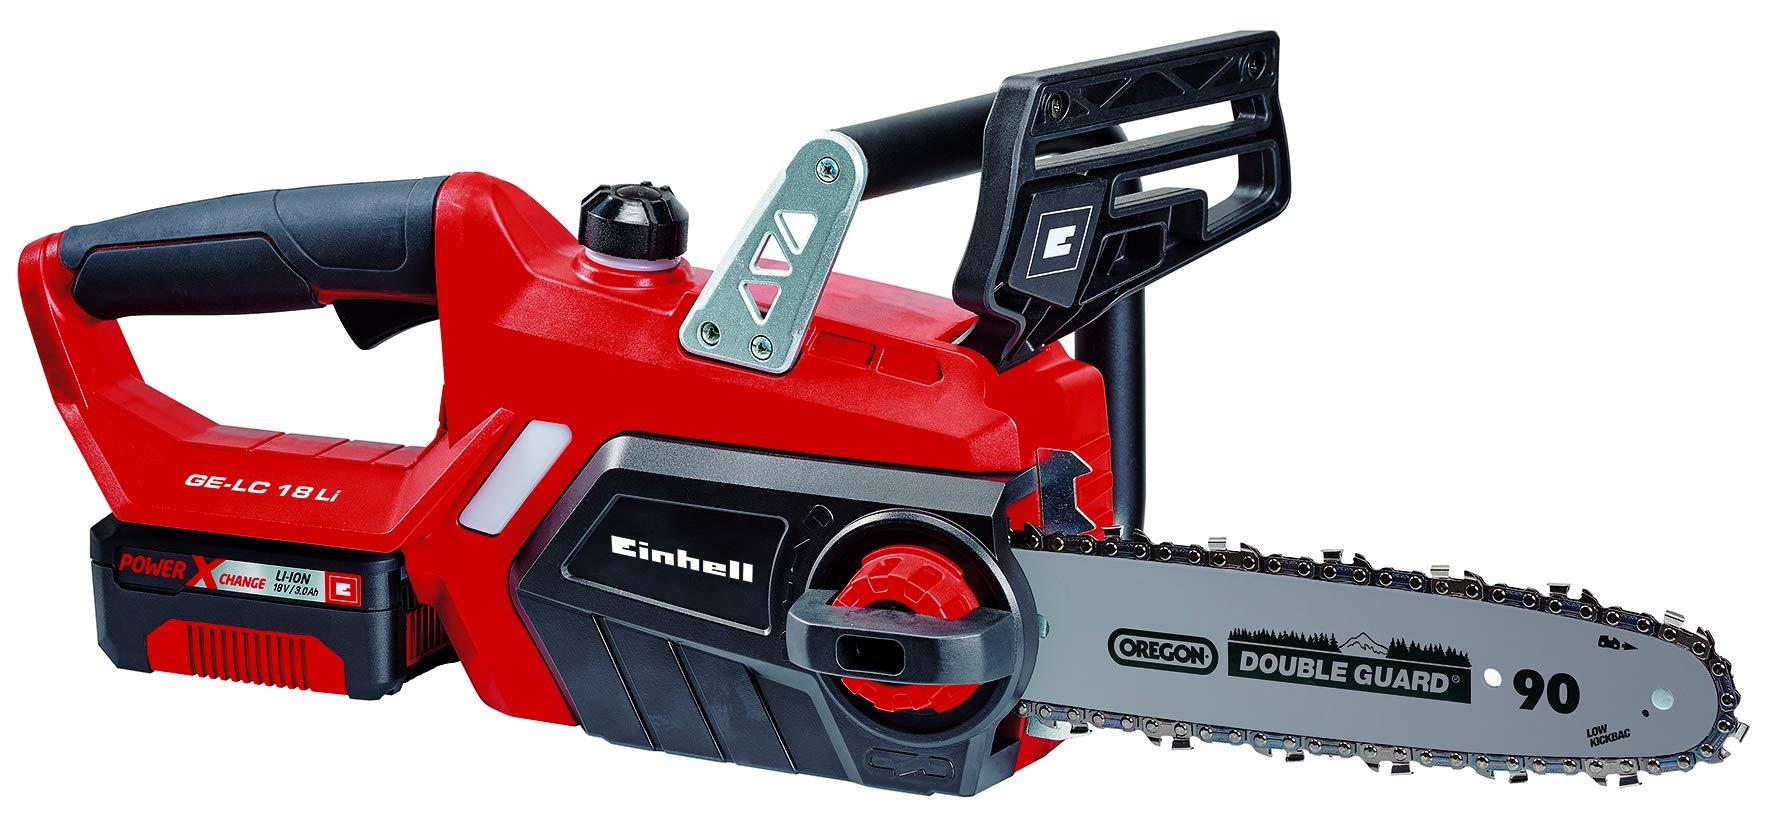 Einhell 4501760 GE-LC 18 Li Kit - Motosierra eléctrica, batería Power X-